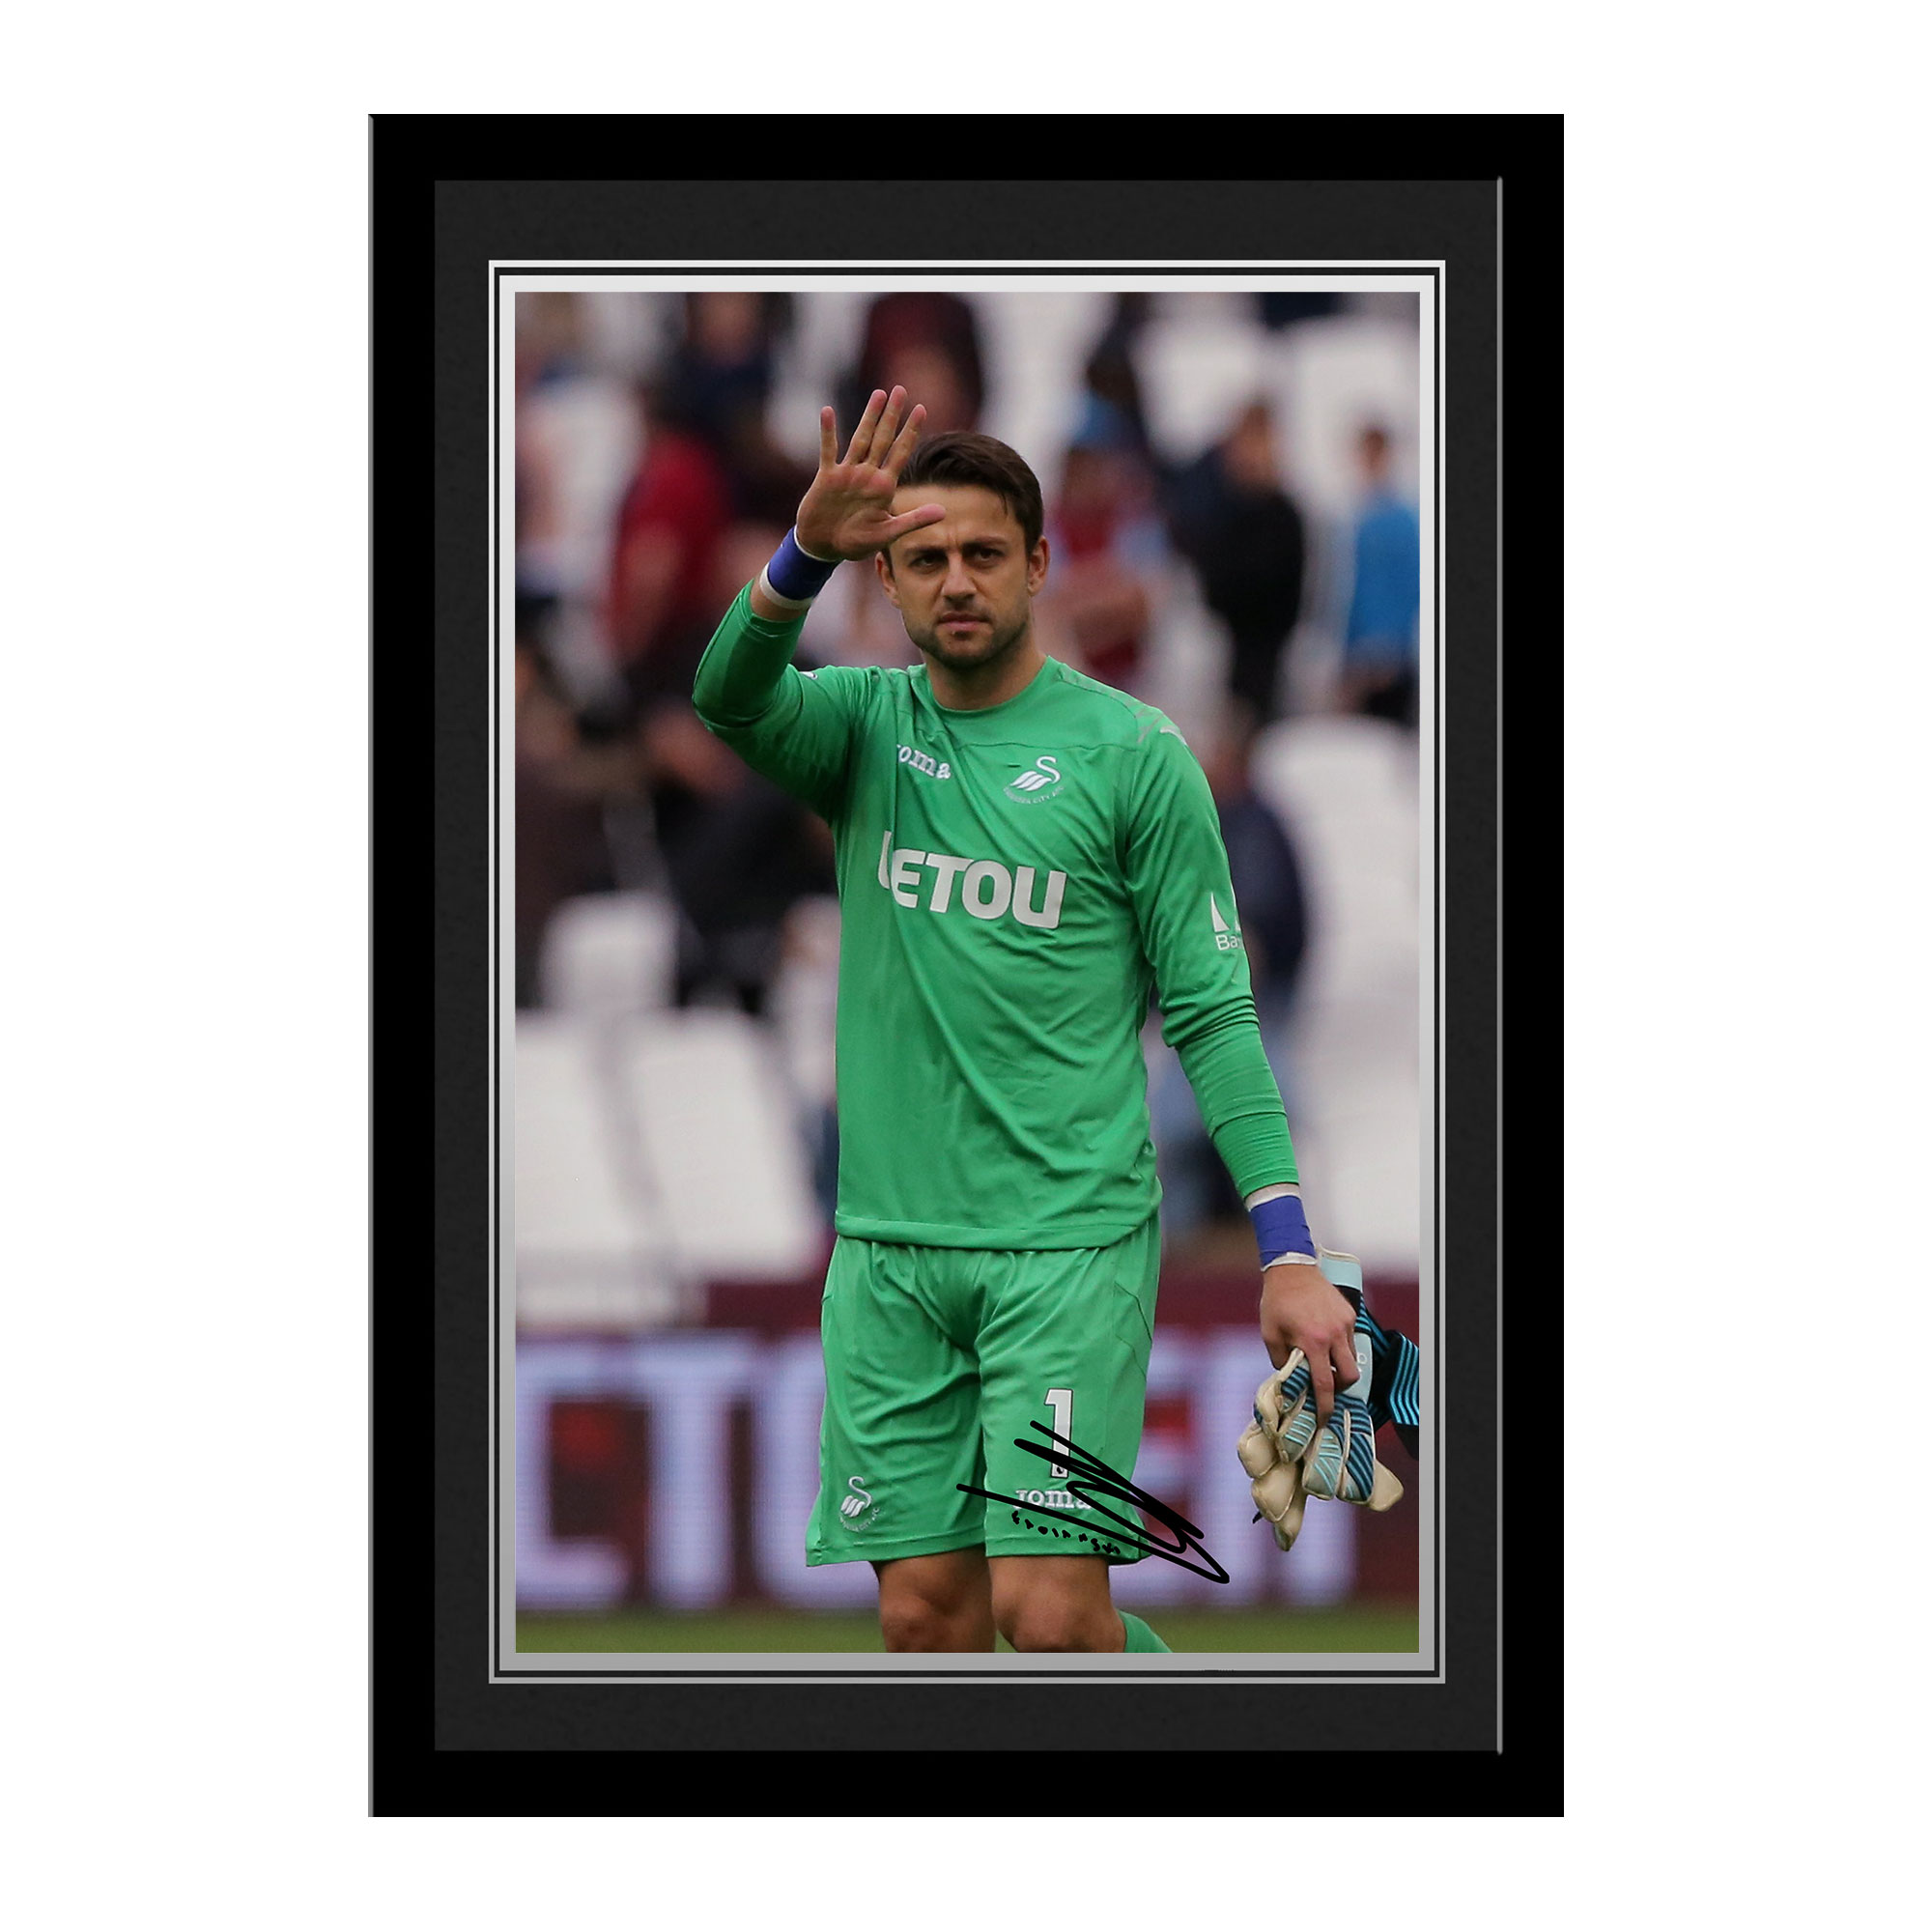 Swansea City AFC Fabianski Autograph Photo Framed